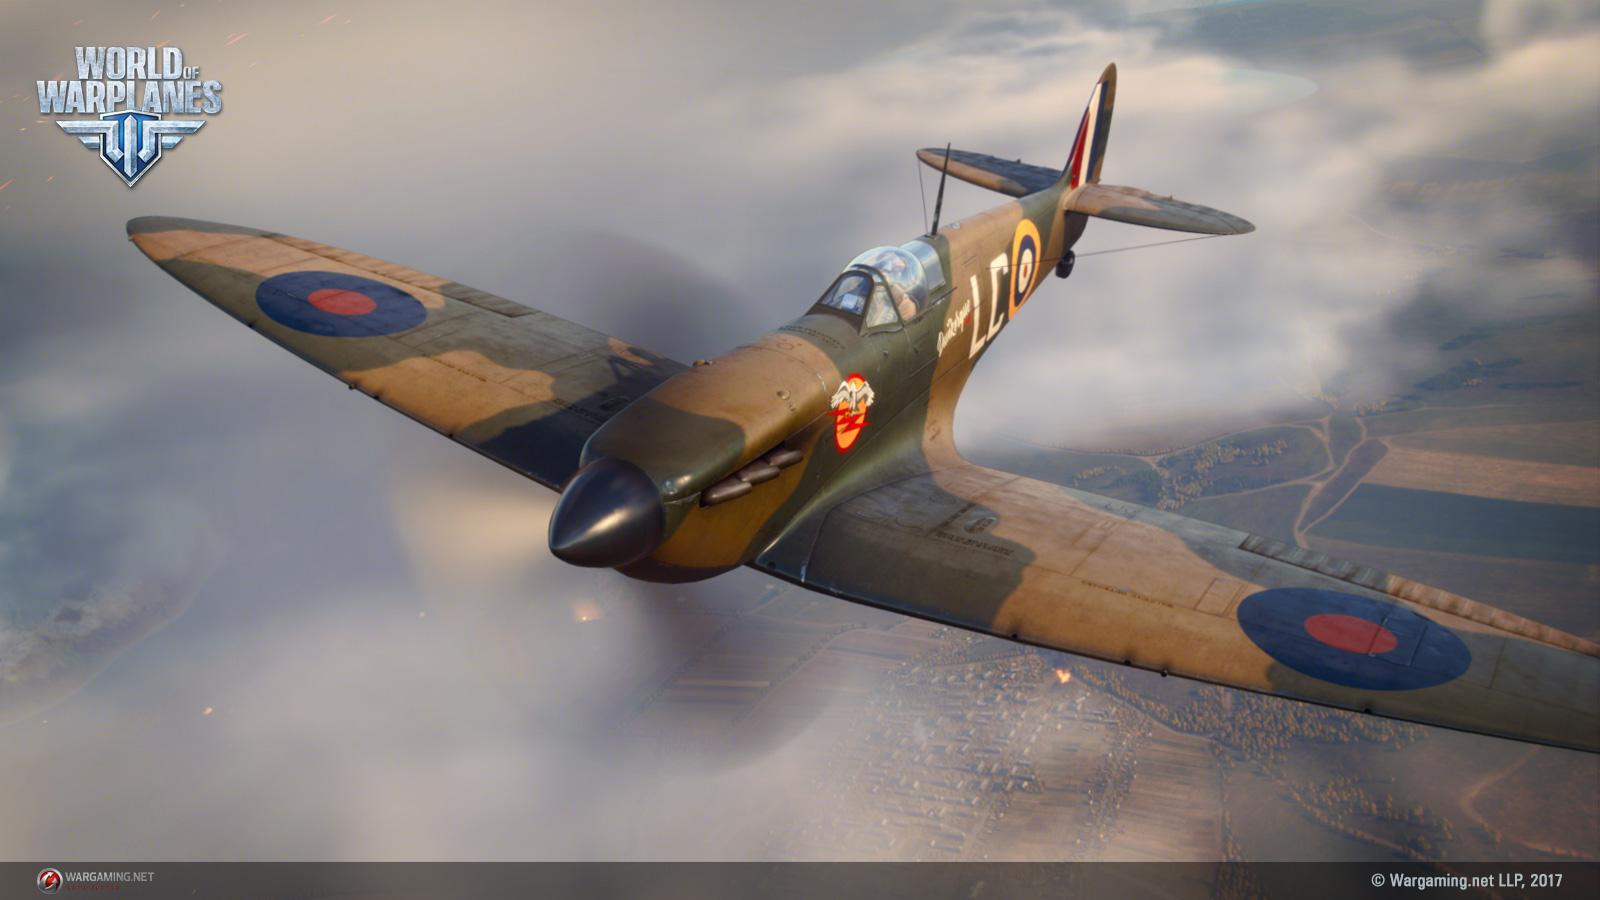 gb-spitfire-ia-screenshots-02-1600x900